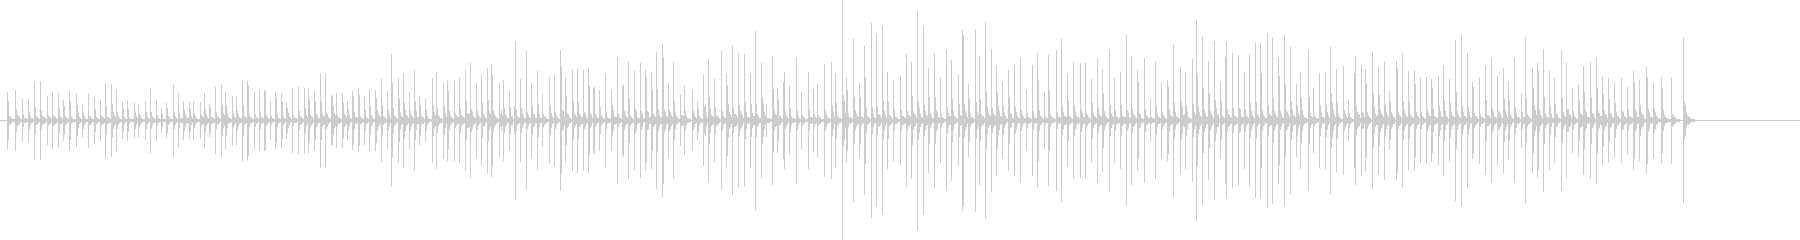 木琴19歌舞伎黒御簾下座音楽和風日本マリの未再生の波形